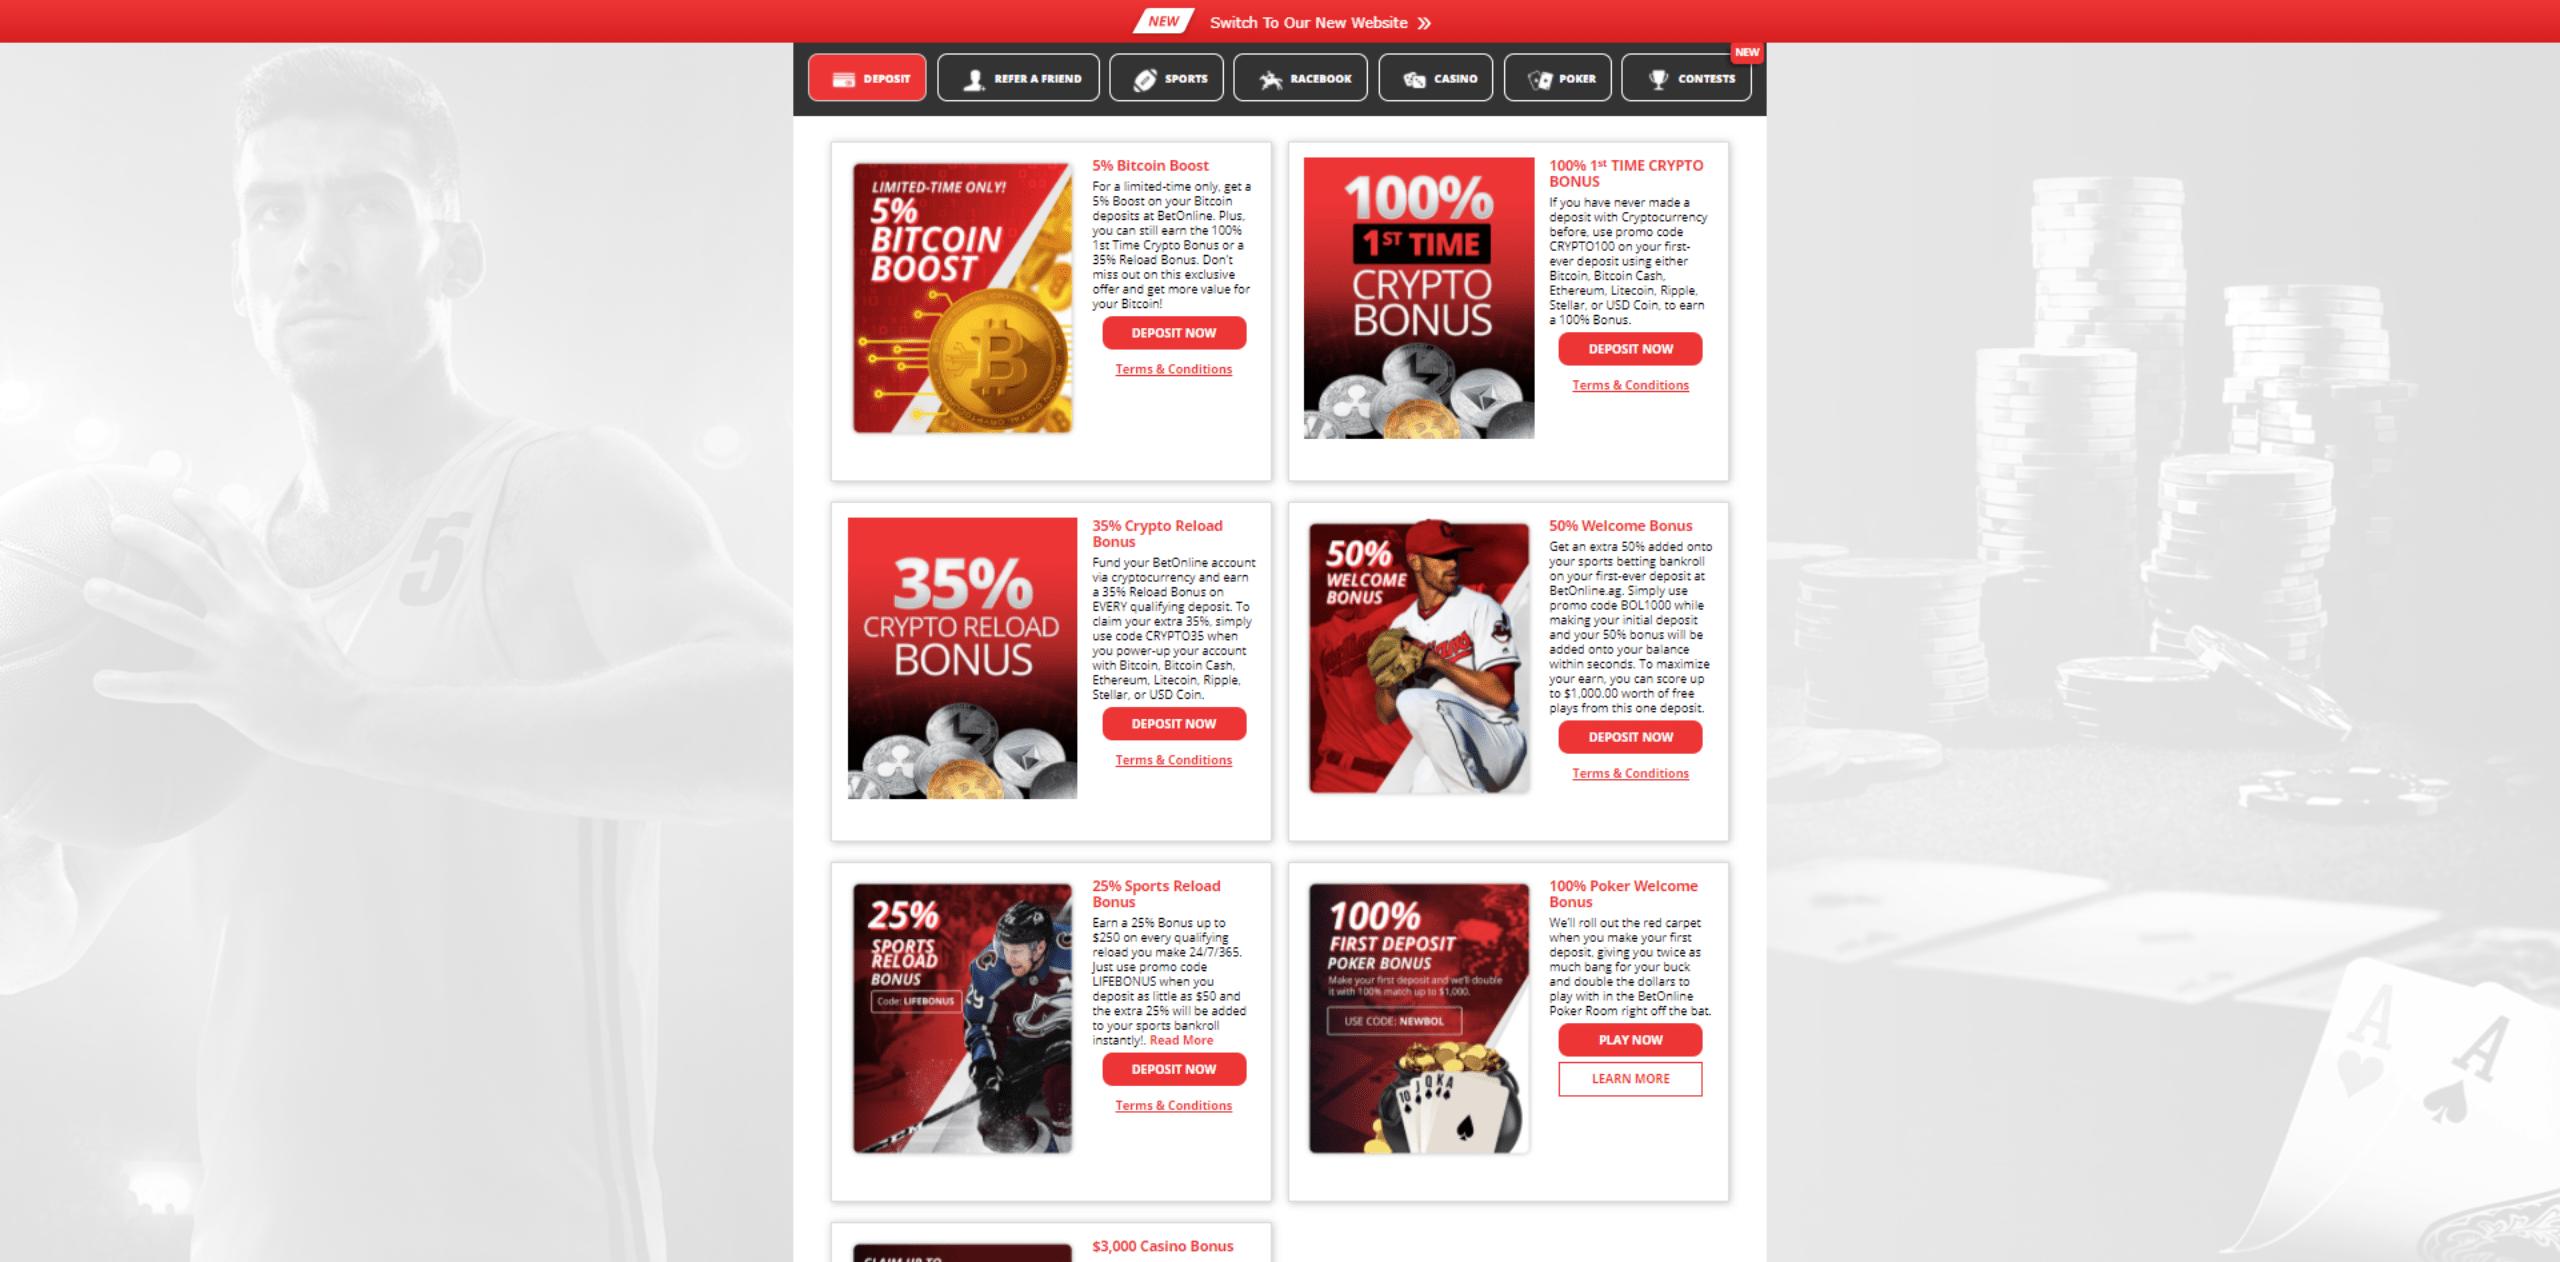 betonline.ag promotions